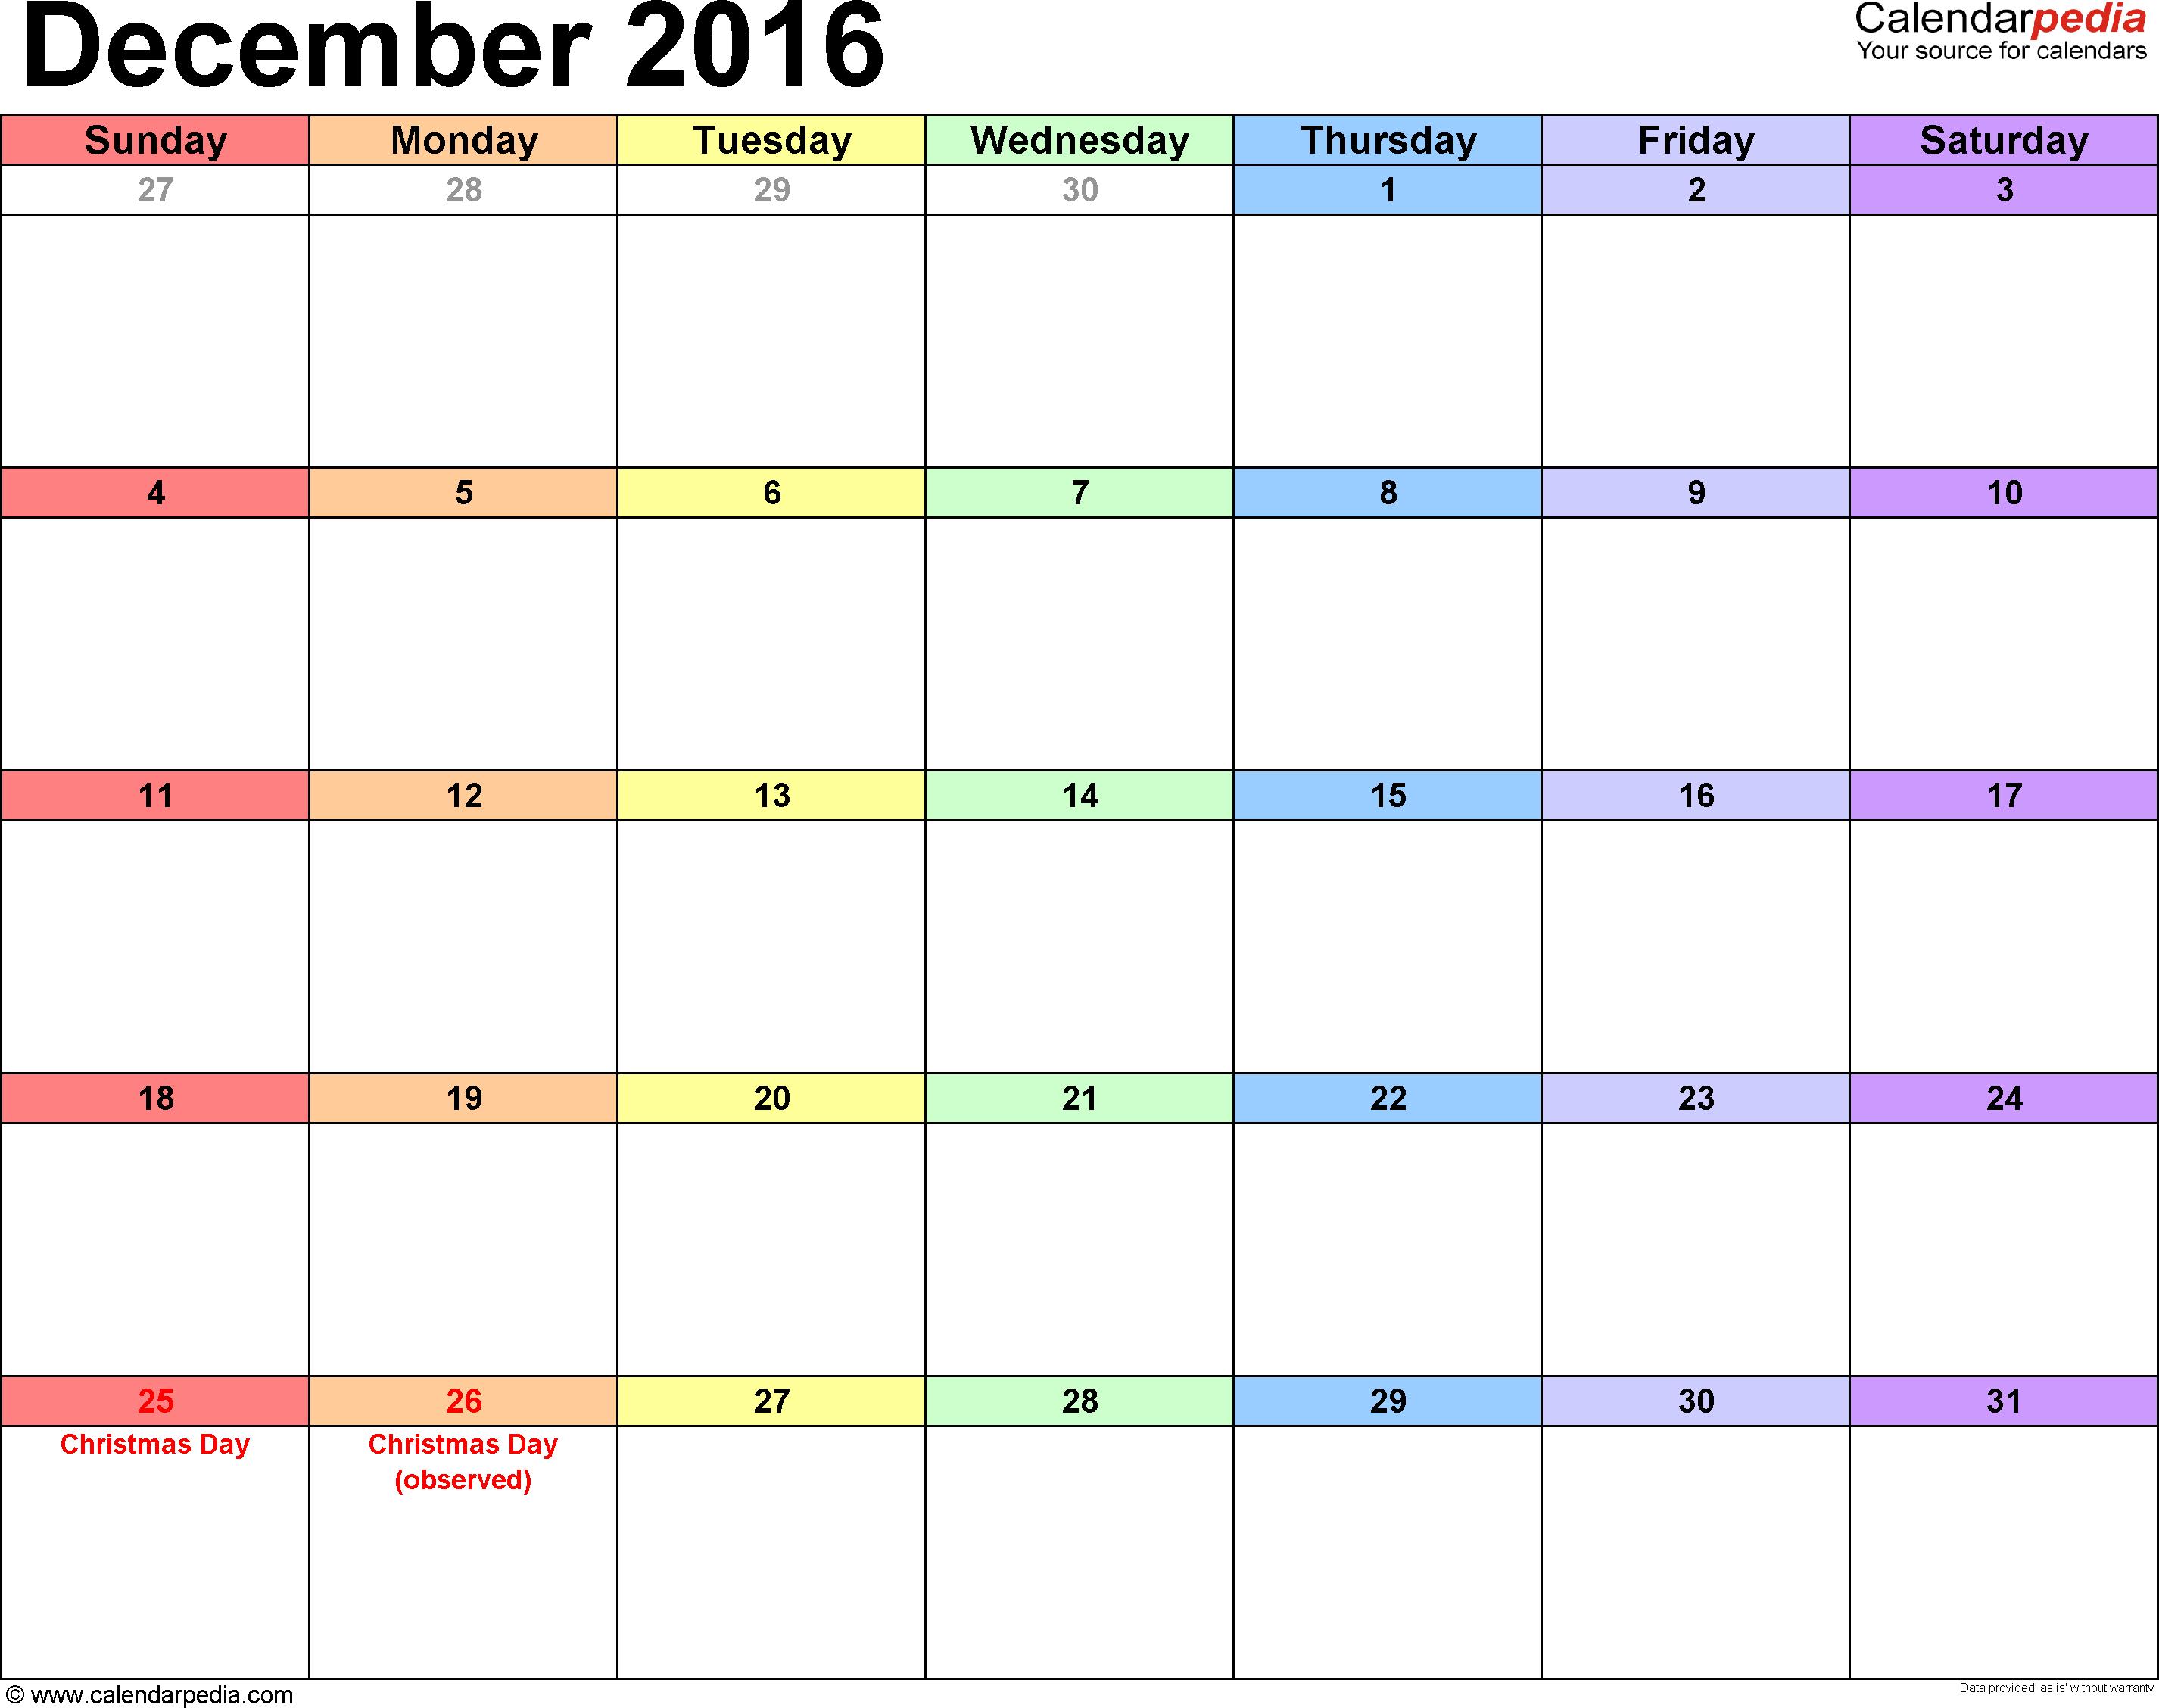 December 2016 Calendars For Word, Excel & Pdf for December Blank Calendar Page Printable